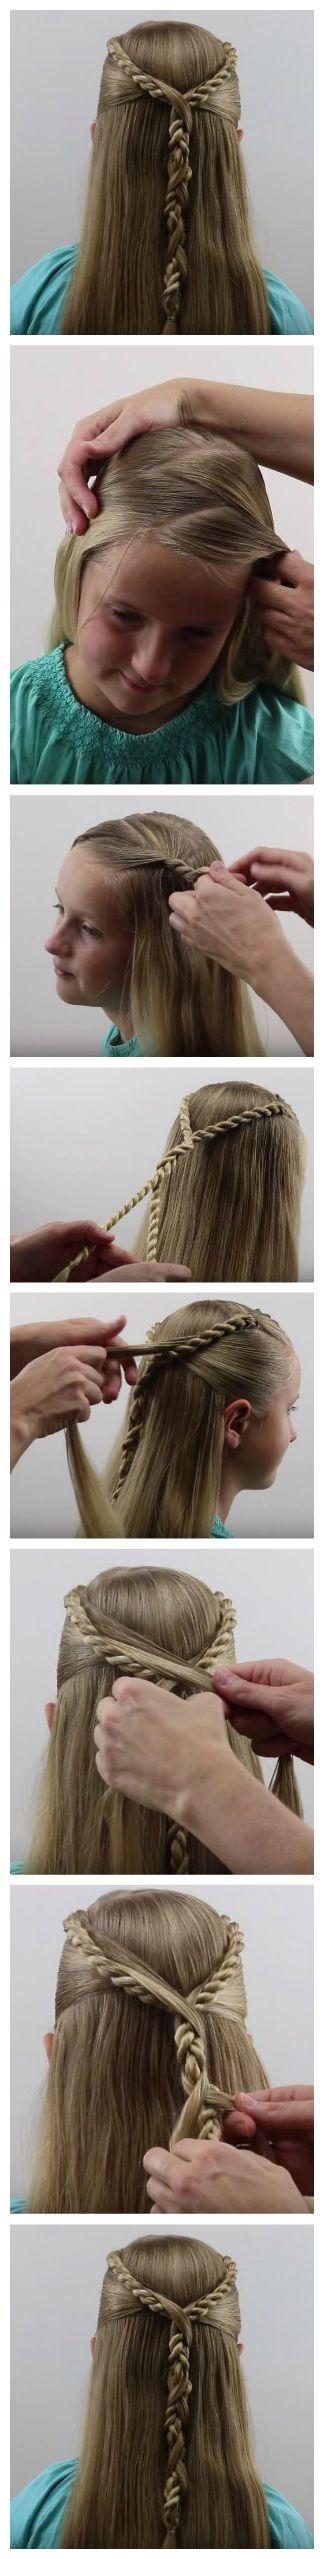 Beautiful Hairstyle -- Rope Twist Hawser Brid Pullback -- #braid #hair #ropebraid #hairstyle #basic_braids #how_to_Braid #alhamdulillah